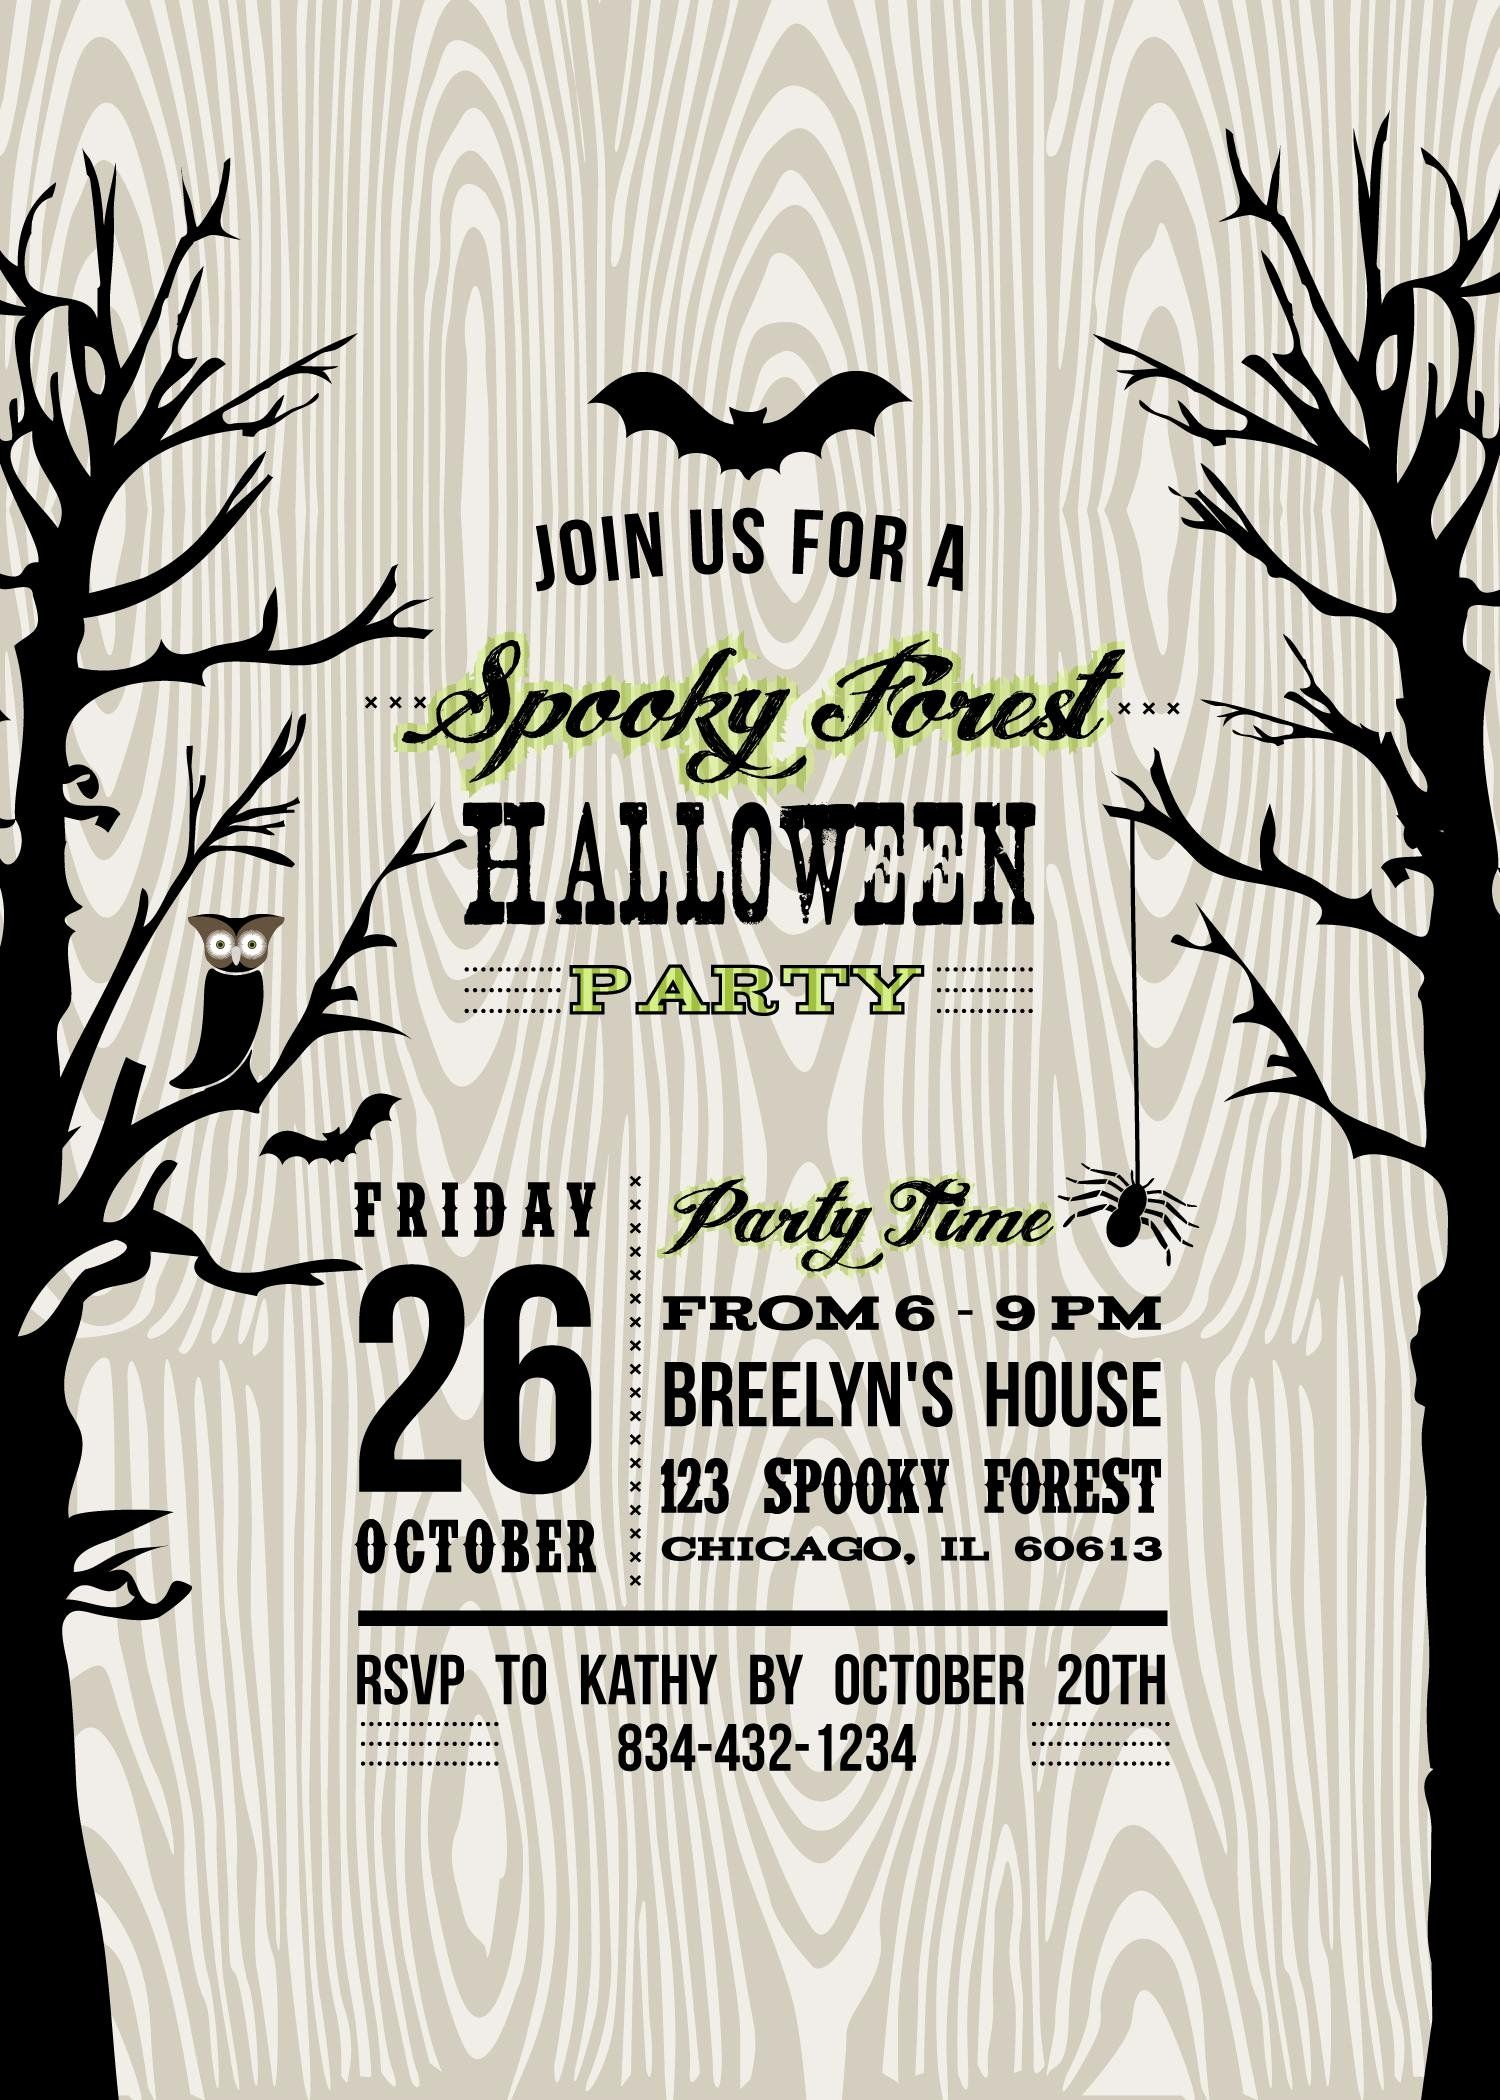 Free Halloween Party Invitation Template Fresh Halloween Invitation Halloween Party Invitations Free Halloween Party Invitations Halloween Invitation Templates